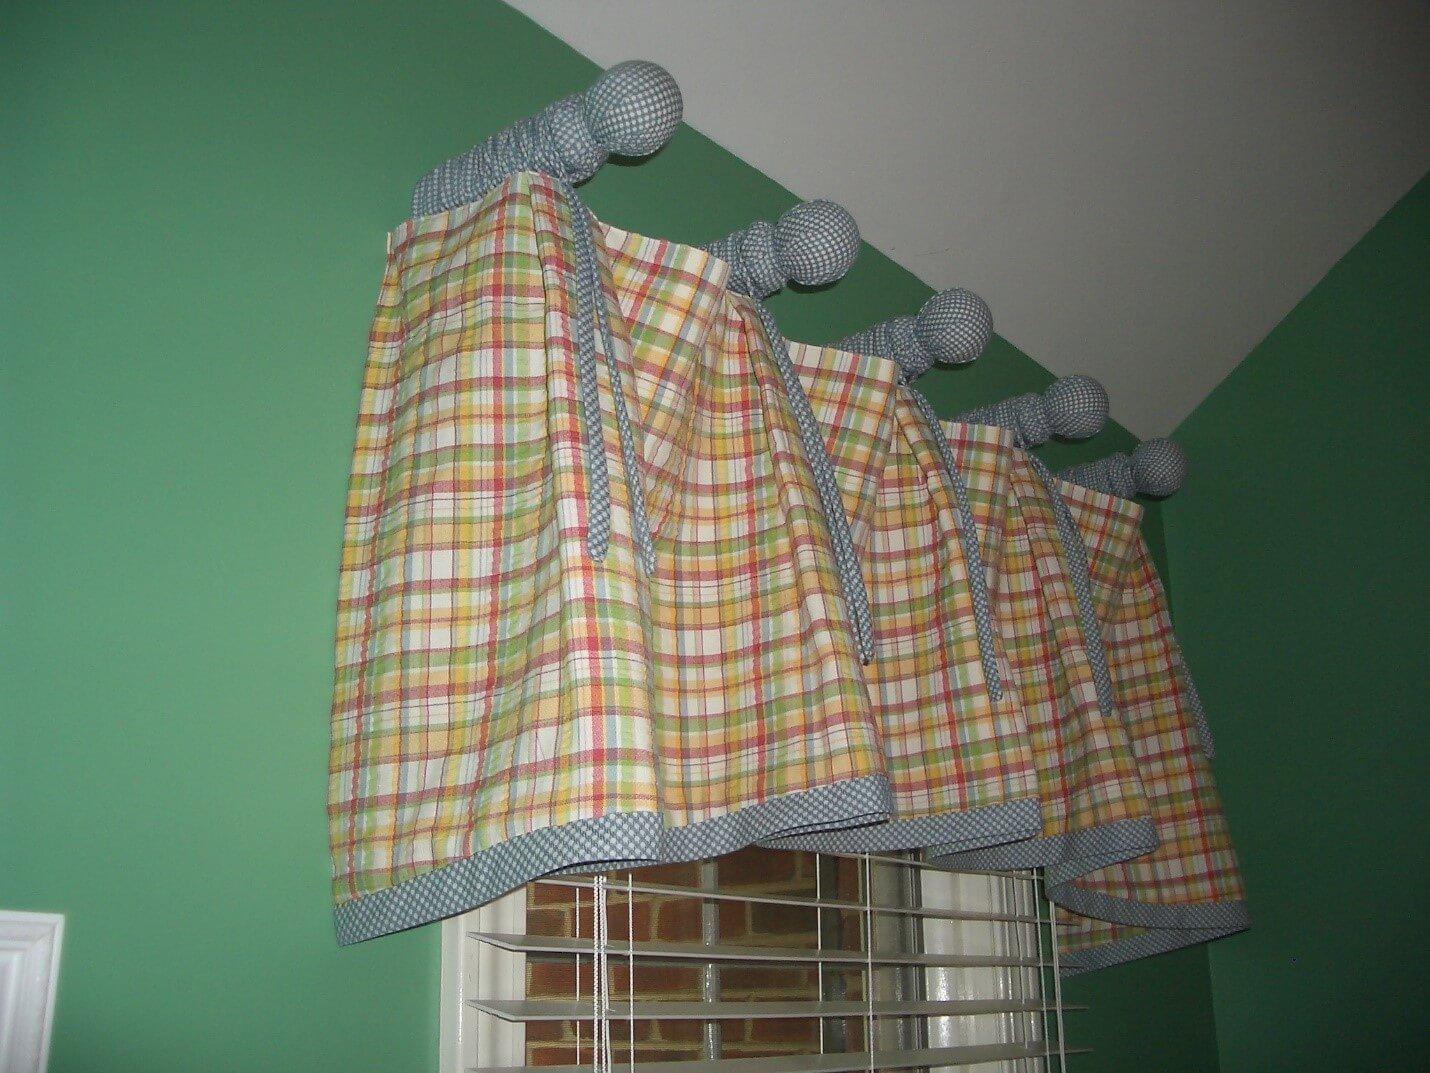 Naperville Home Design, Burr Ridge Home Design, bedding, curtains, custom designs, draperies, blinds, shutters, interior design